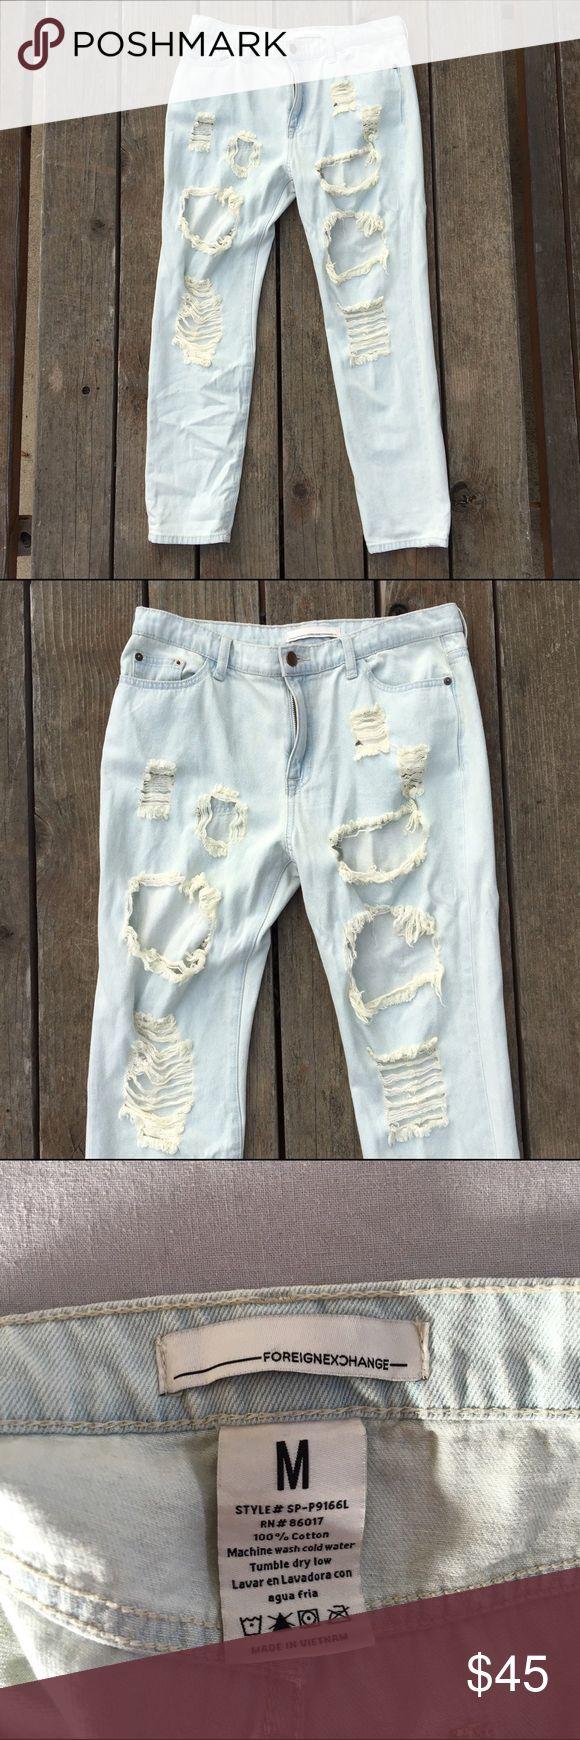 NWOT Foreign Exchange Boyfriend Fit jeans Distressed loose fitting boyfriend style jeans. Never worn!! Fits size 27-28 jeans. NWOT! Foreign Exchange Jeans Boyfriend